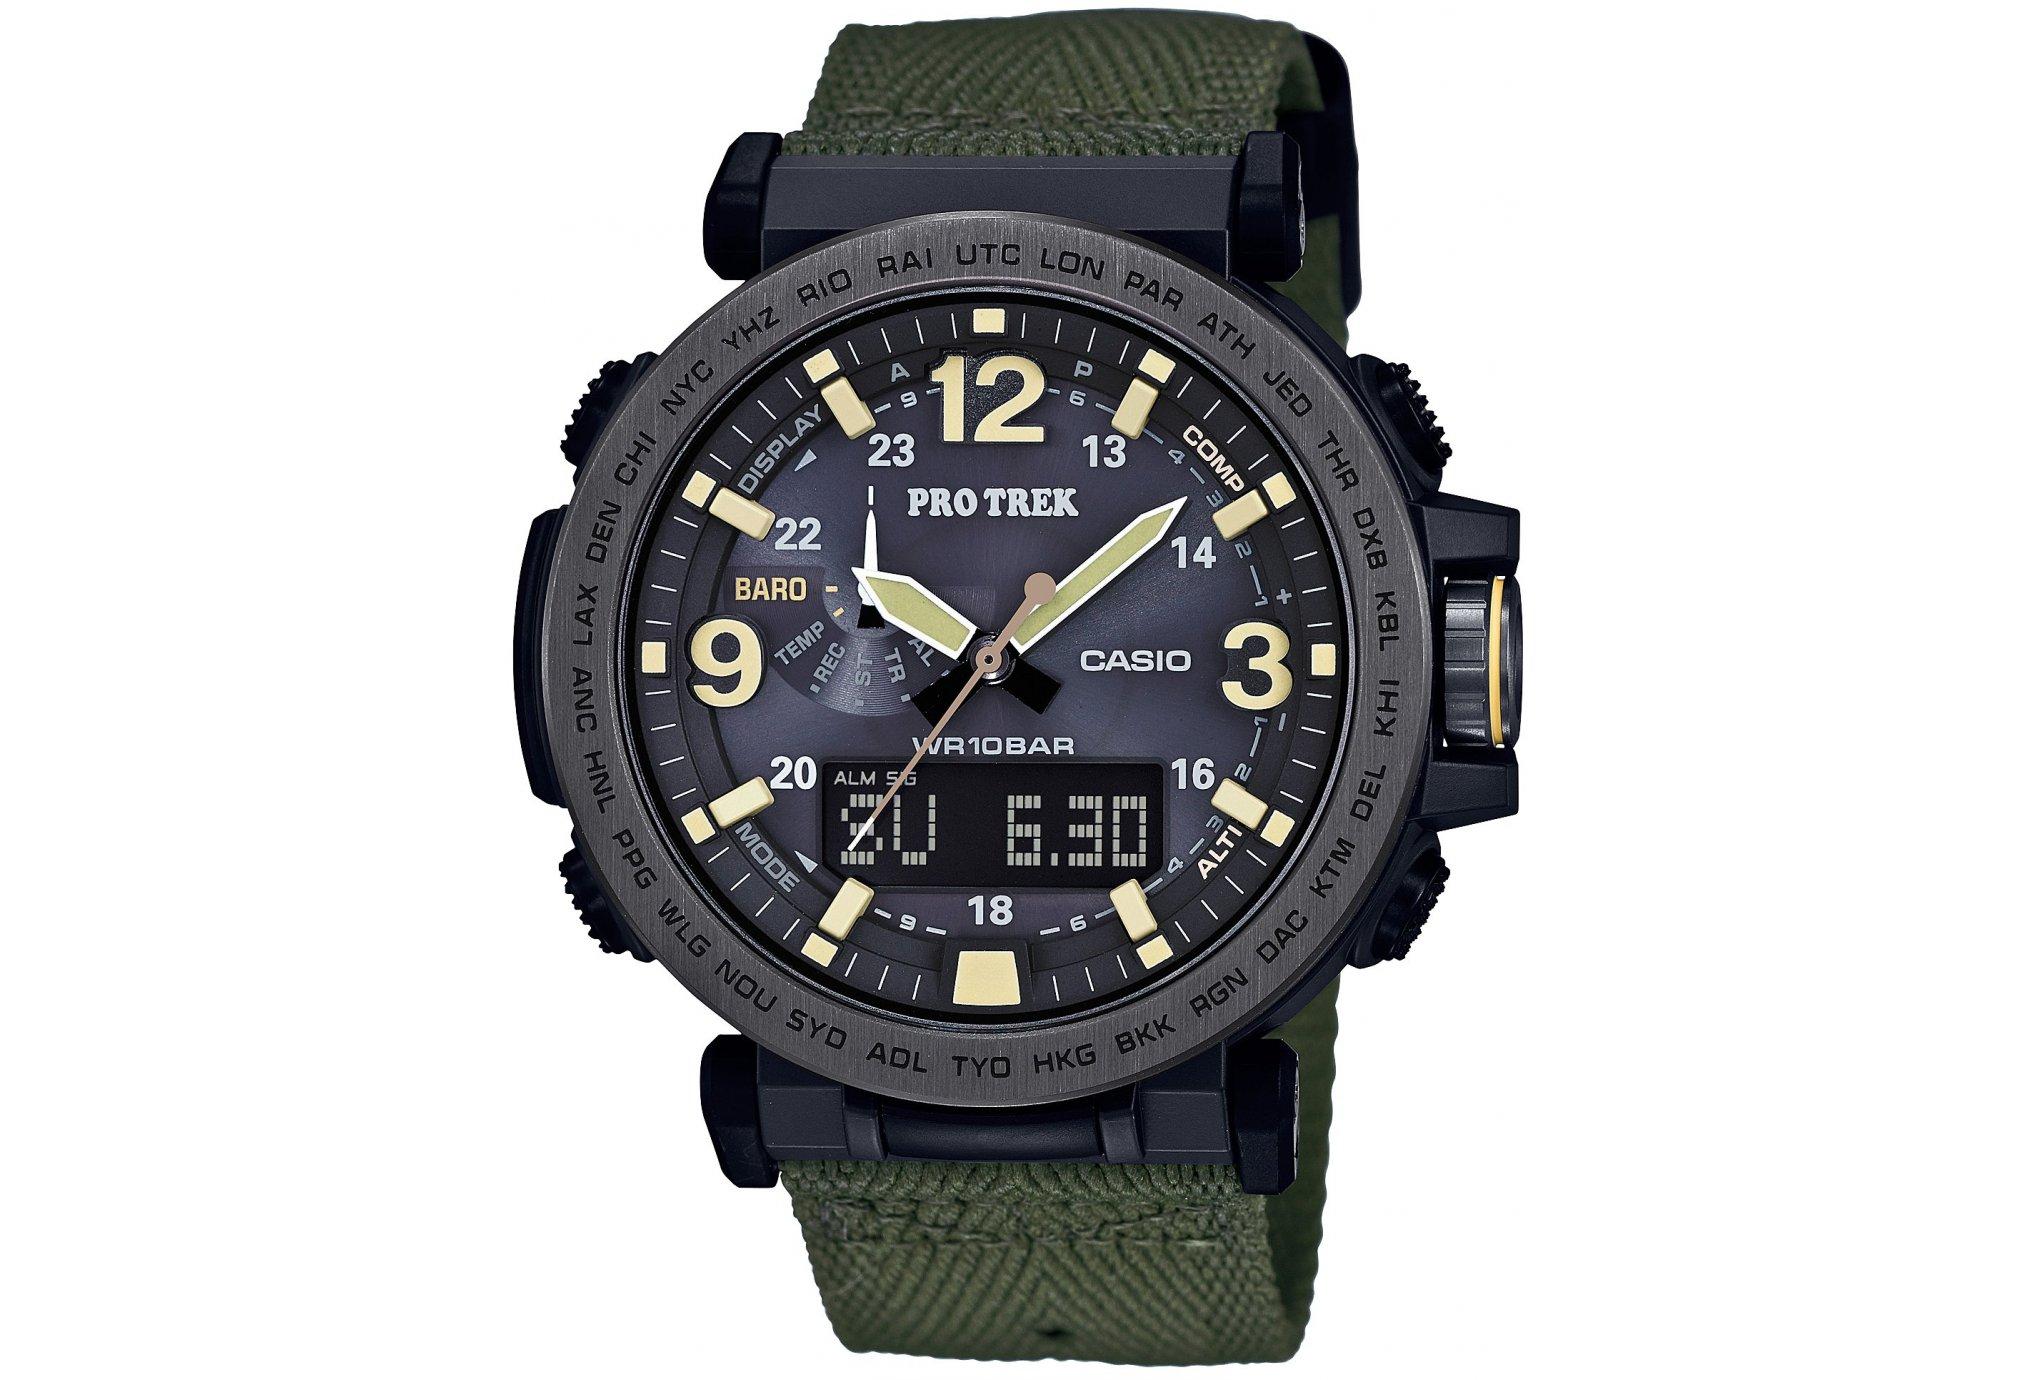 Casio Pro trek prg-600yb montres de sport